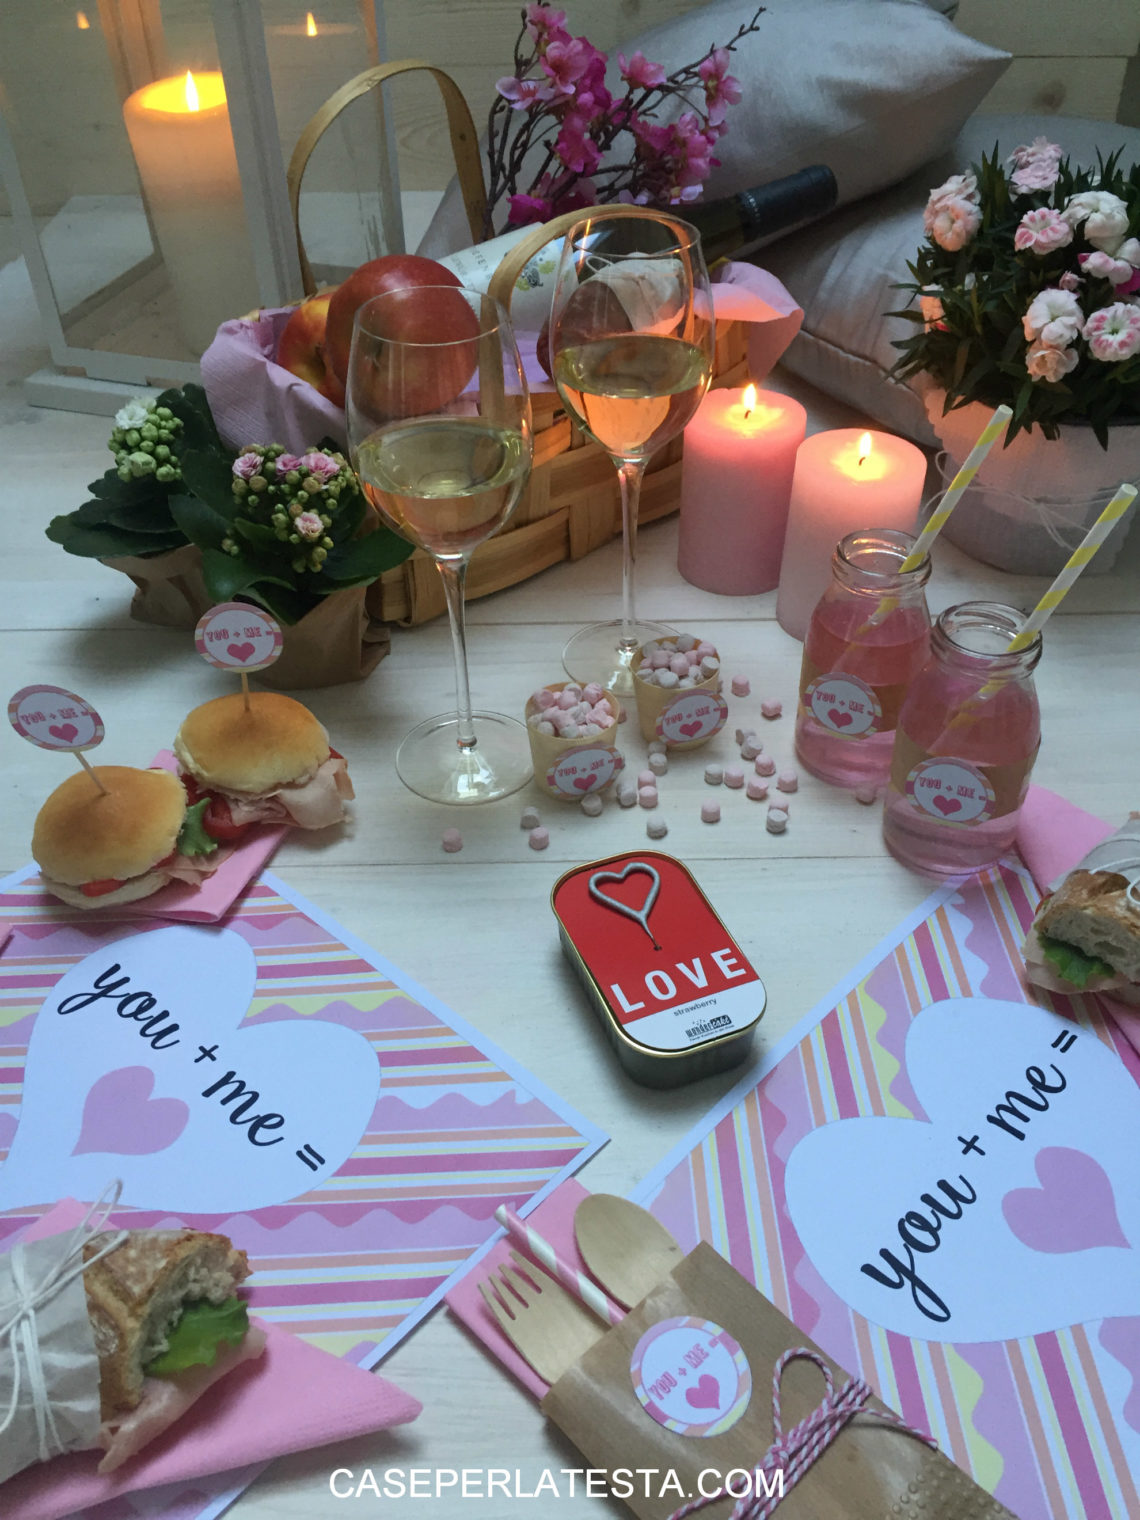 San Valentino Archivi - Caseperlatesta